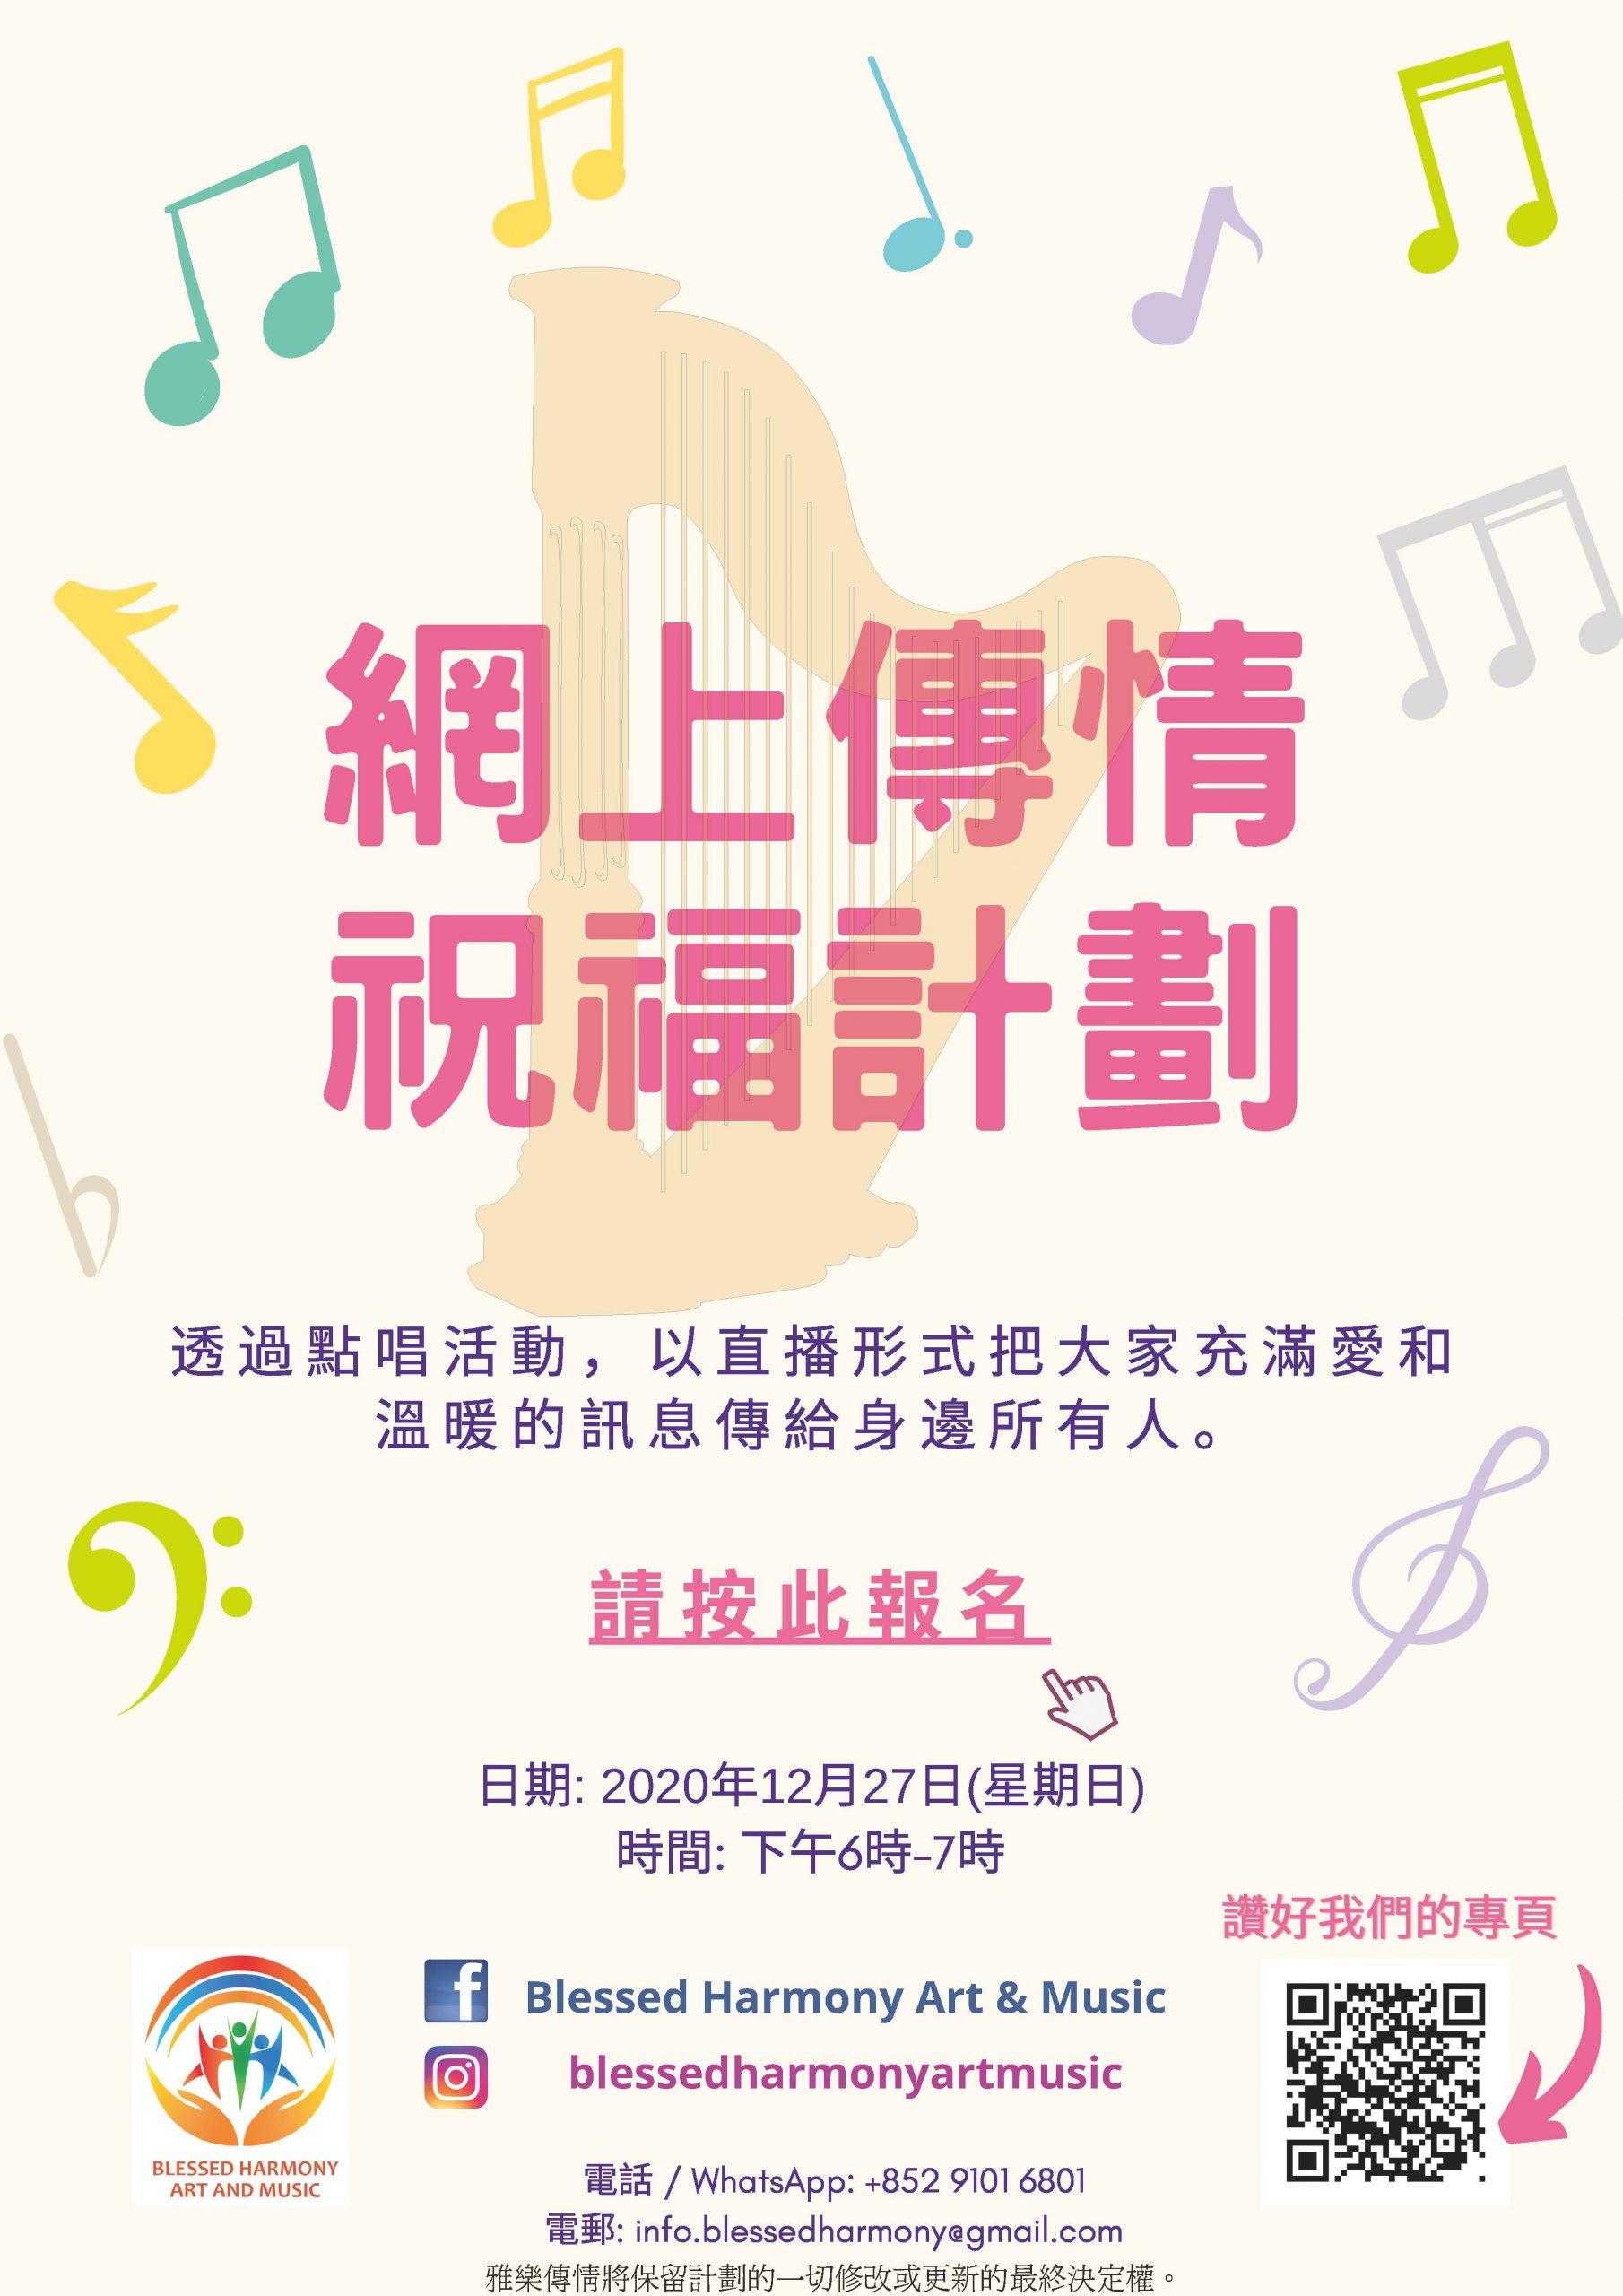 🌈❣️雅樂傳情 Blessed Harmony Art and Music🌈❣️第二次音樂分享會